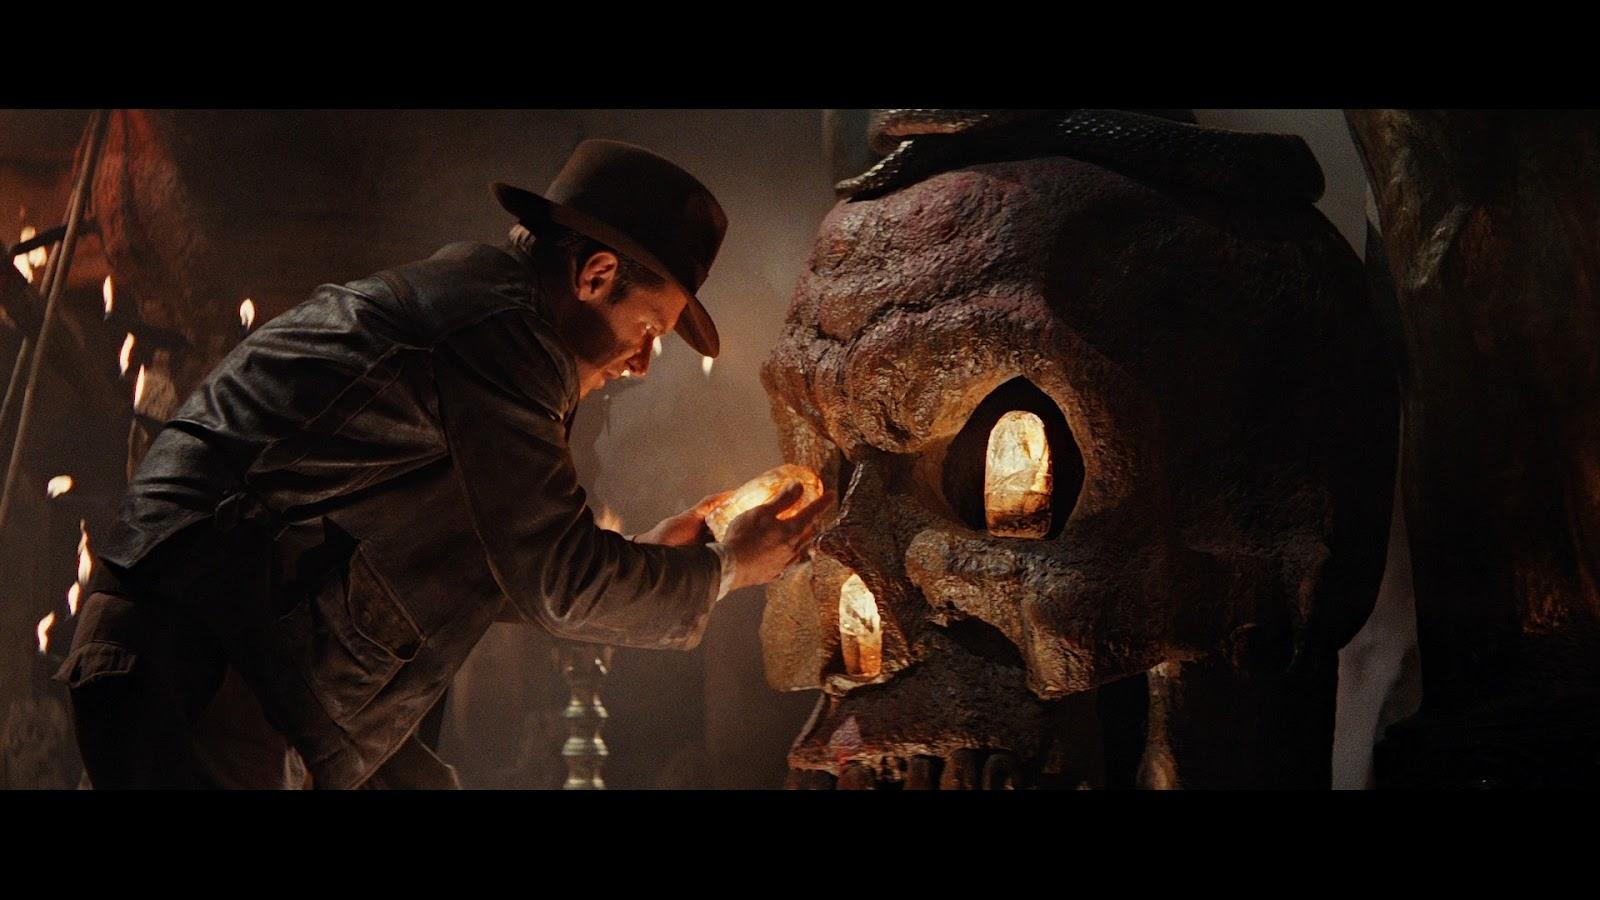 Temple of Doom Screencap - Indiana Jones Image (18905087